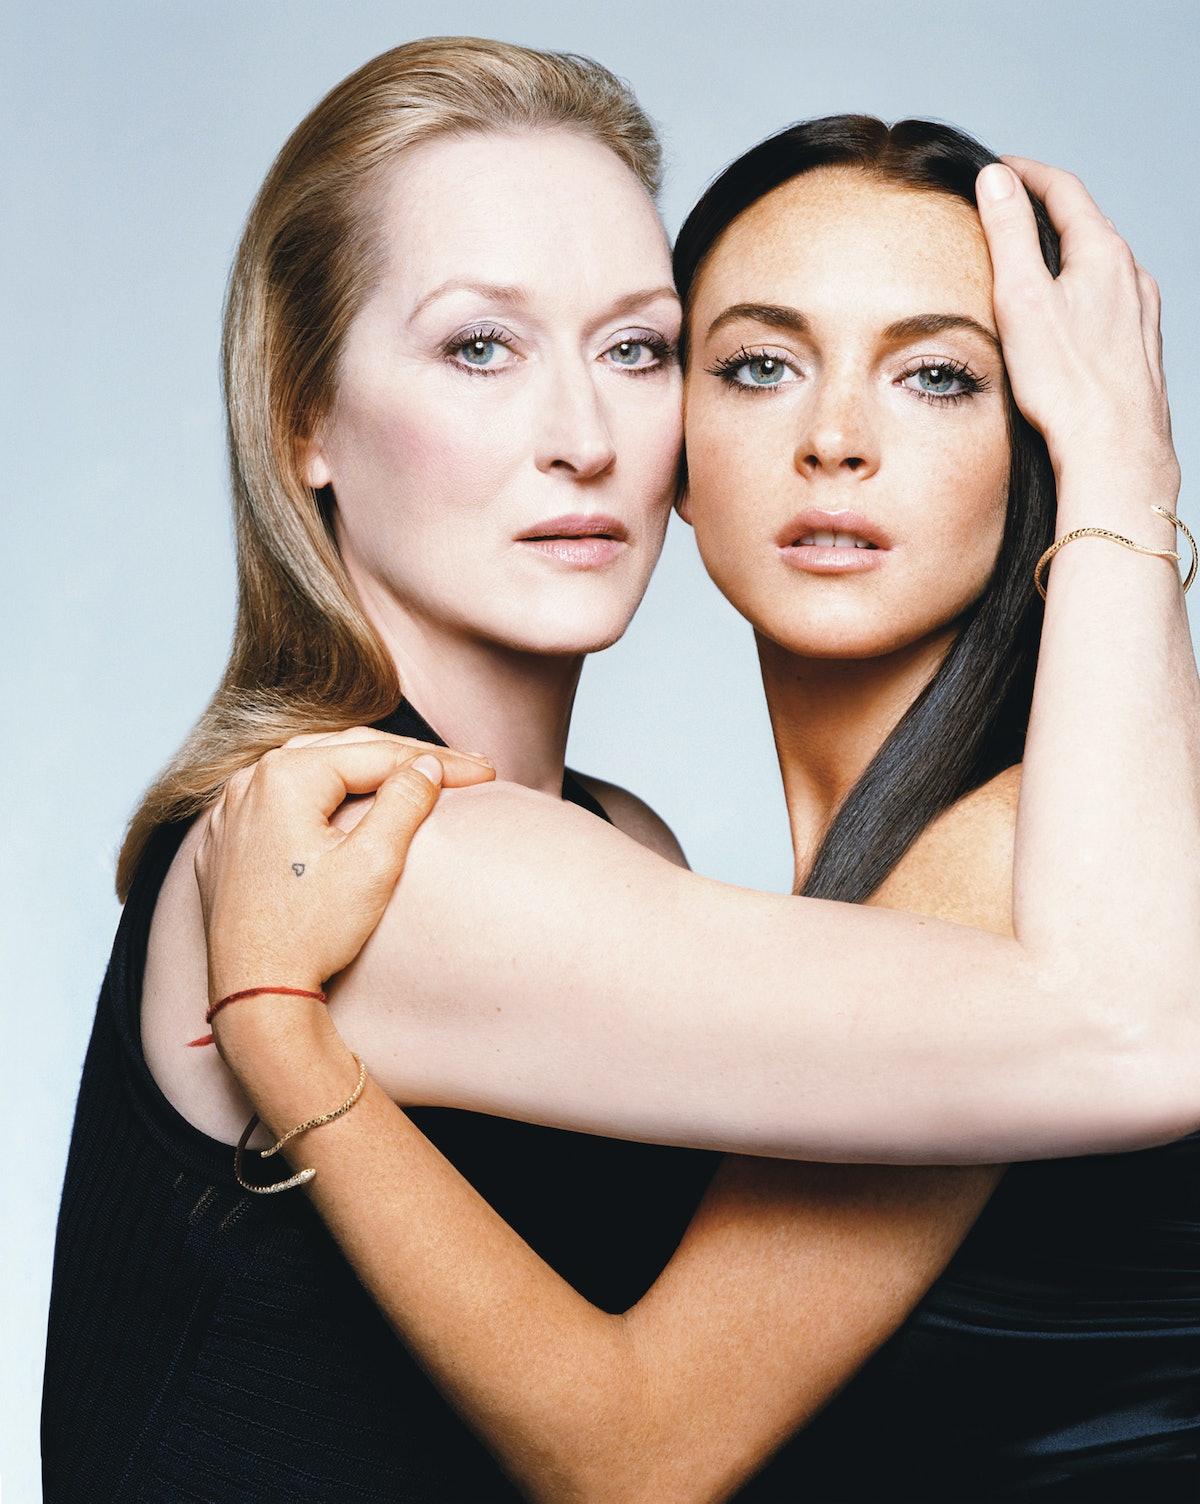 Meryl Streep and Lindsey Lohan